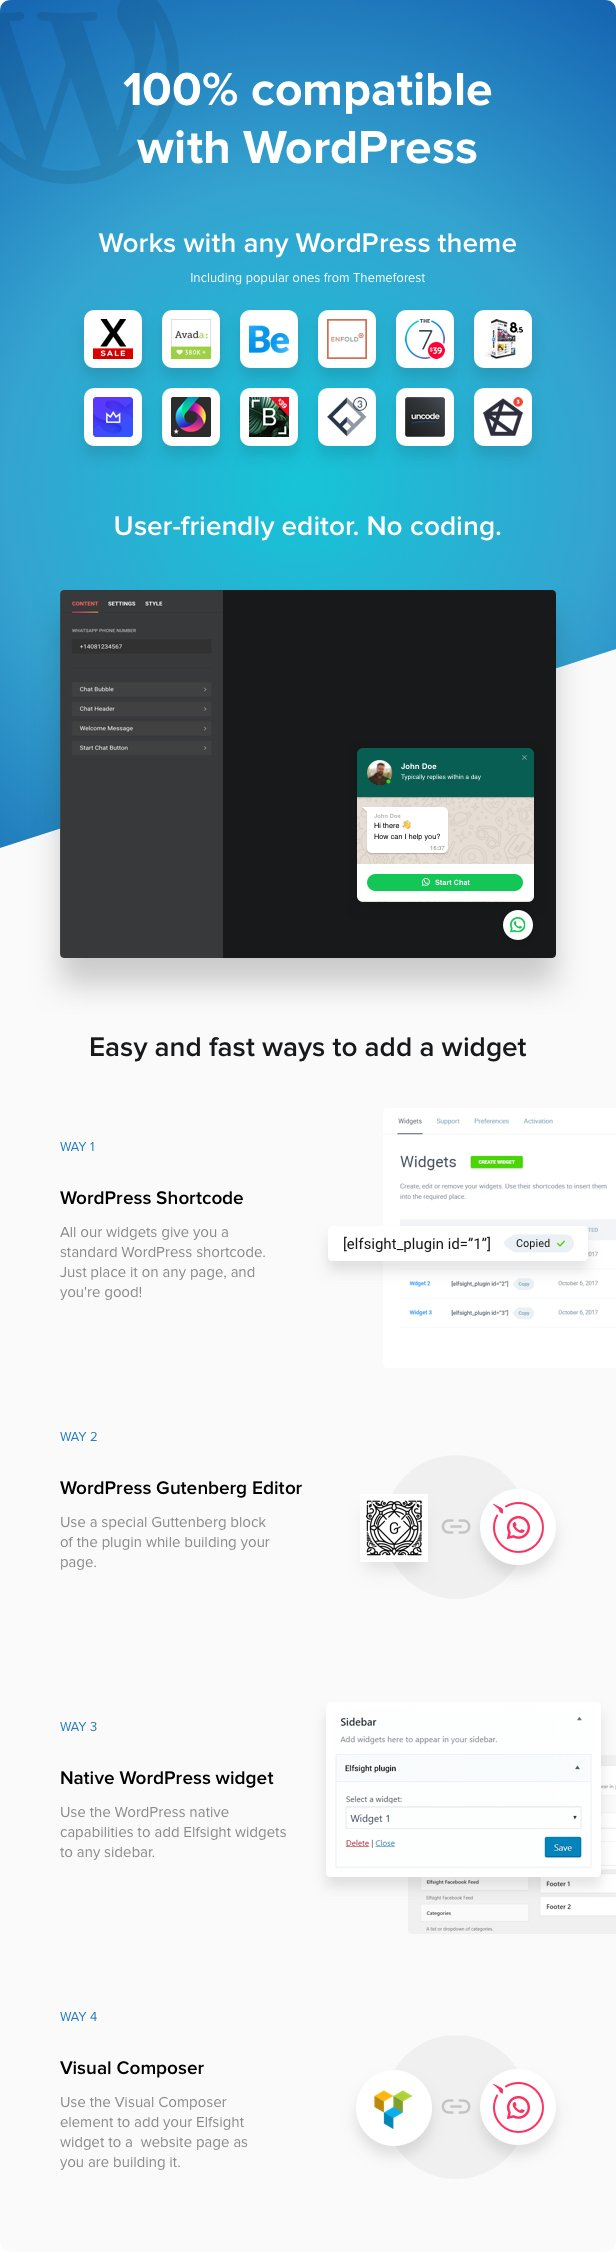 WhatsApp Chat - WordPress WhatsApp Chat plugin - 2